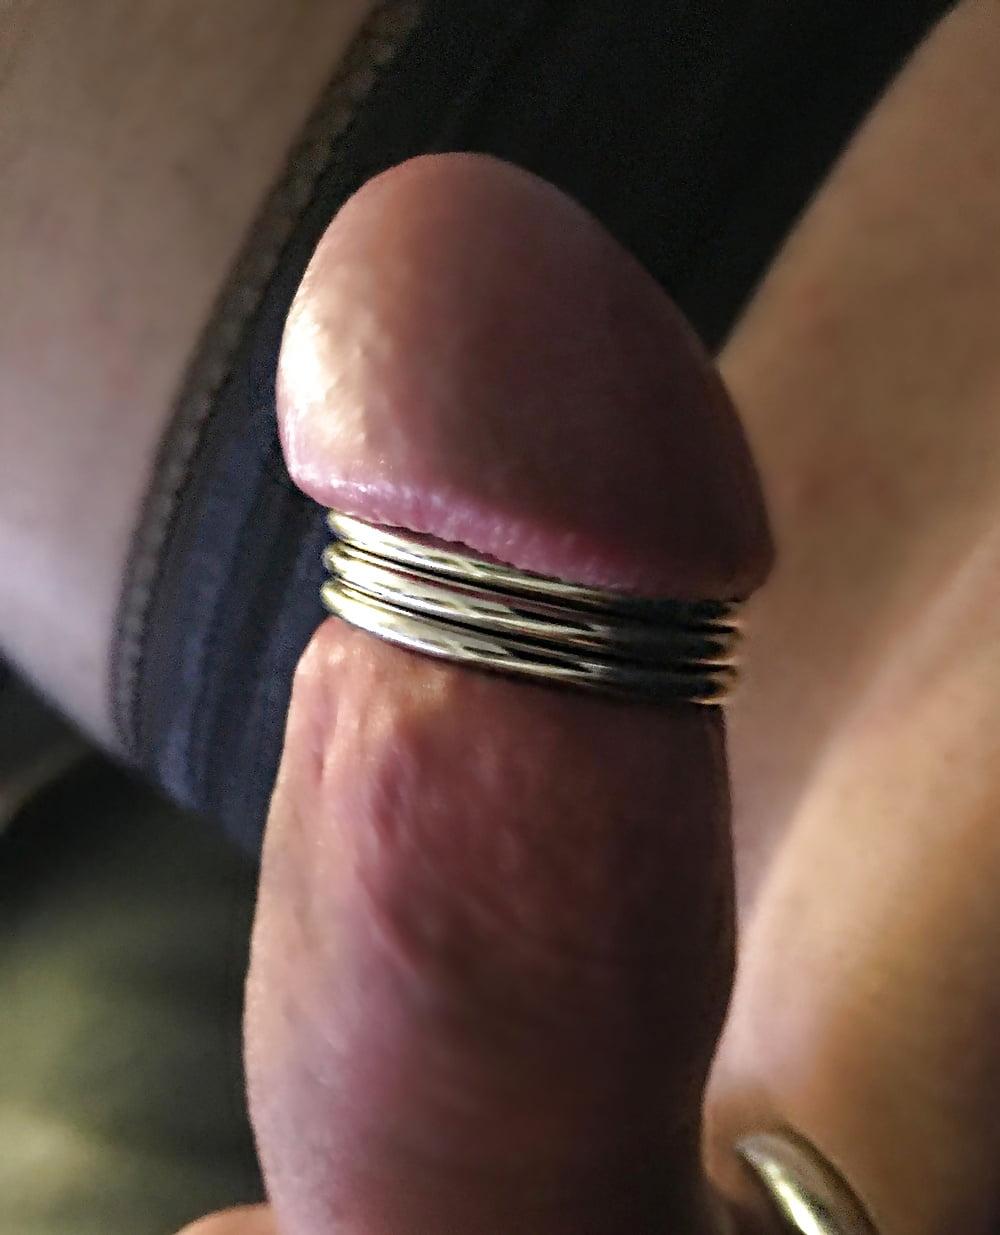 Homemade Cock Rings Lovegasm